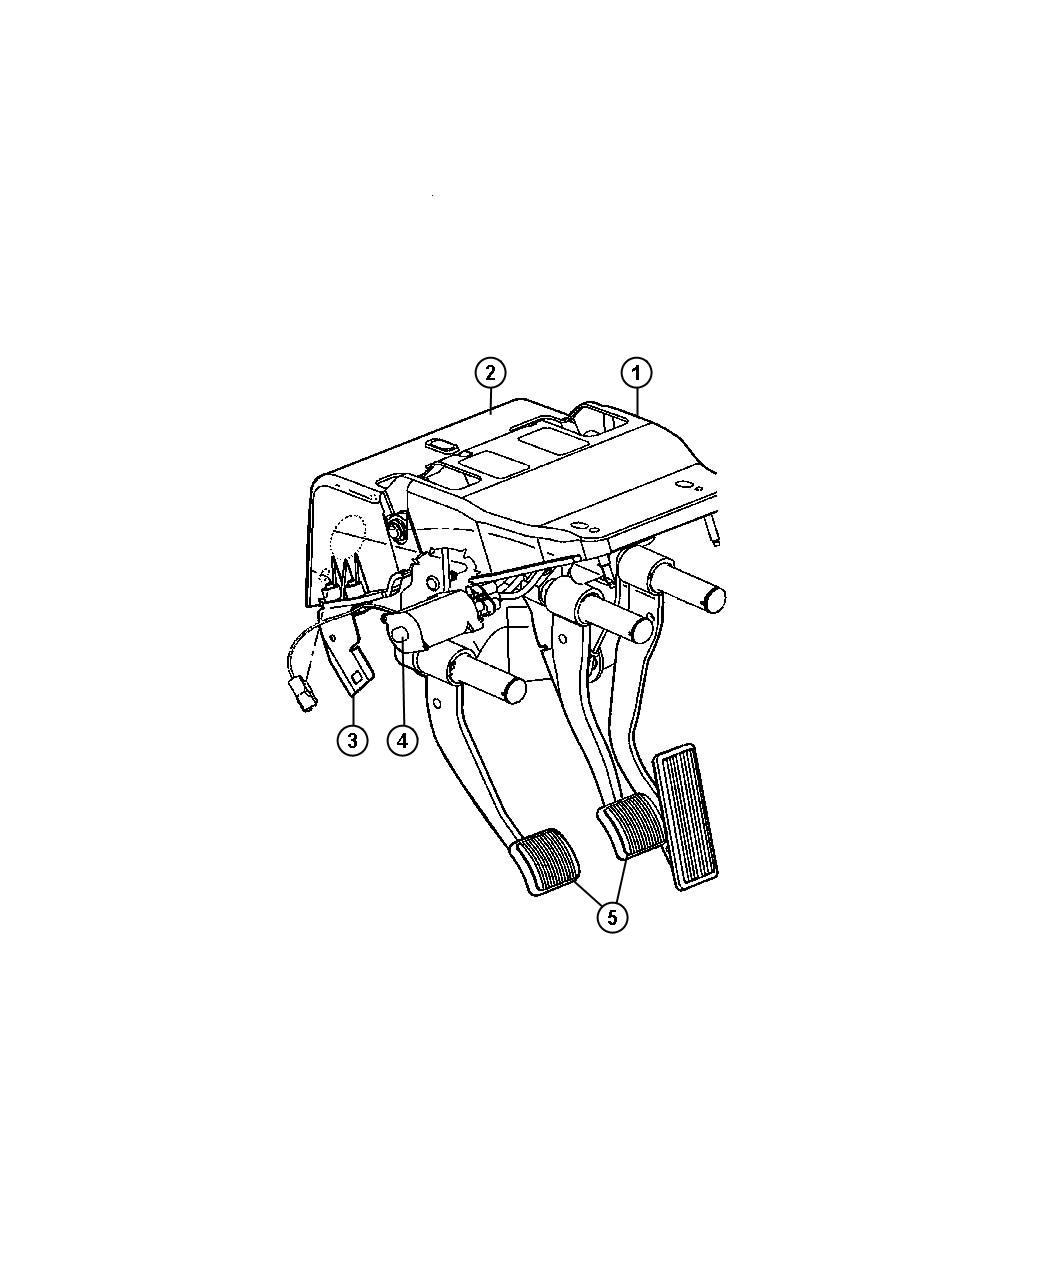 Dodge Ram Used For Pedal And Bracket Brake